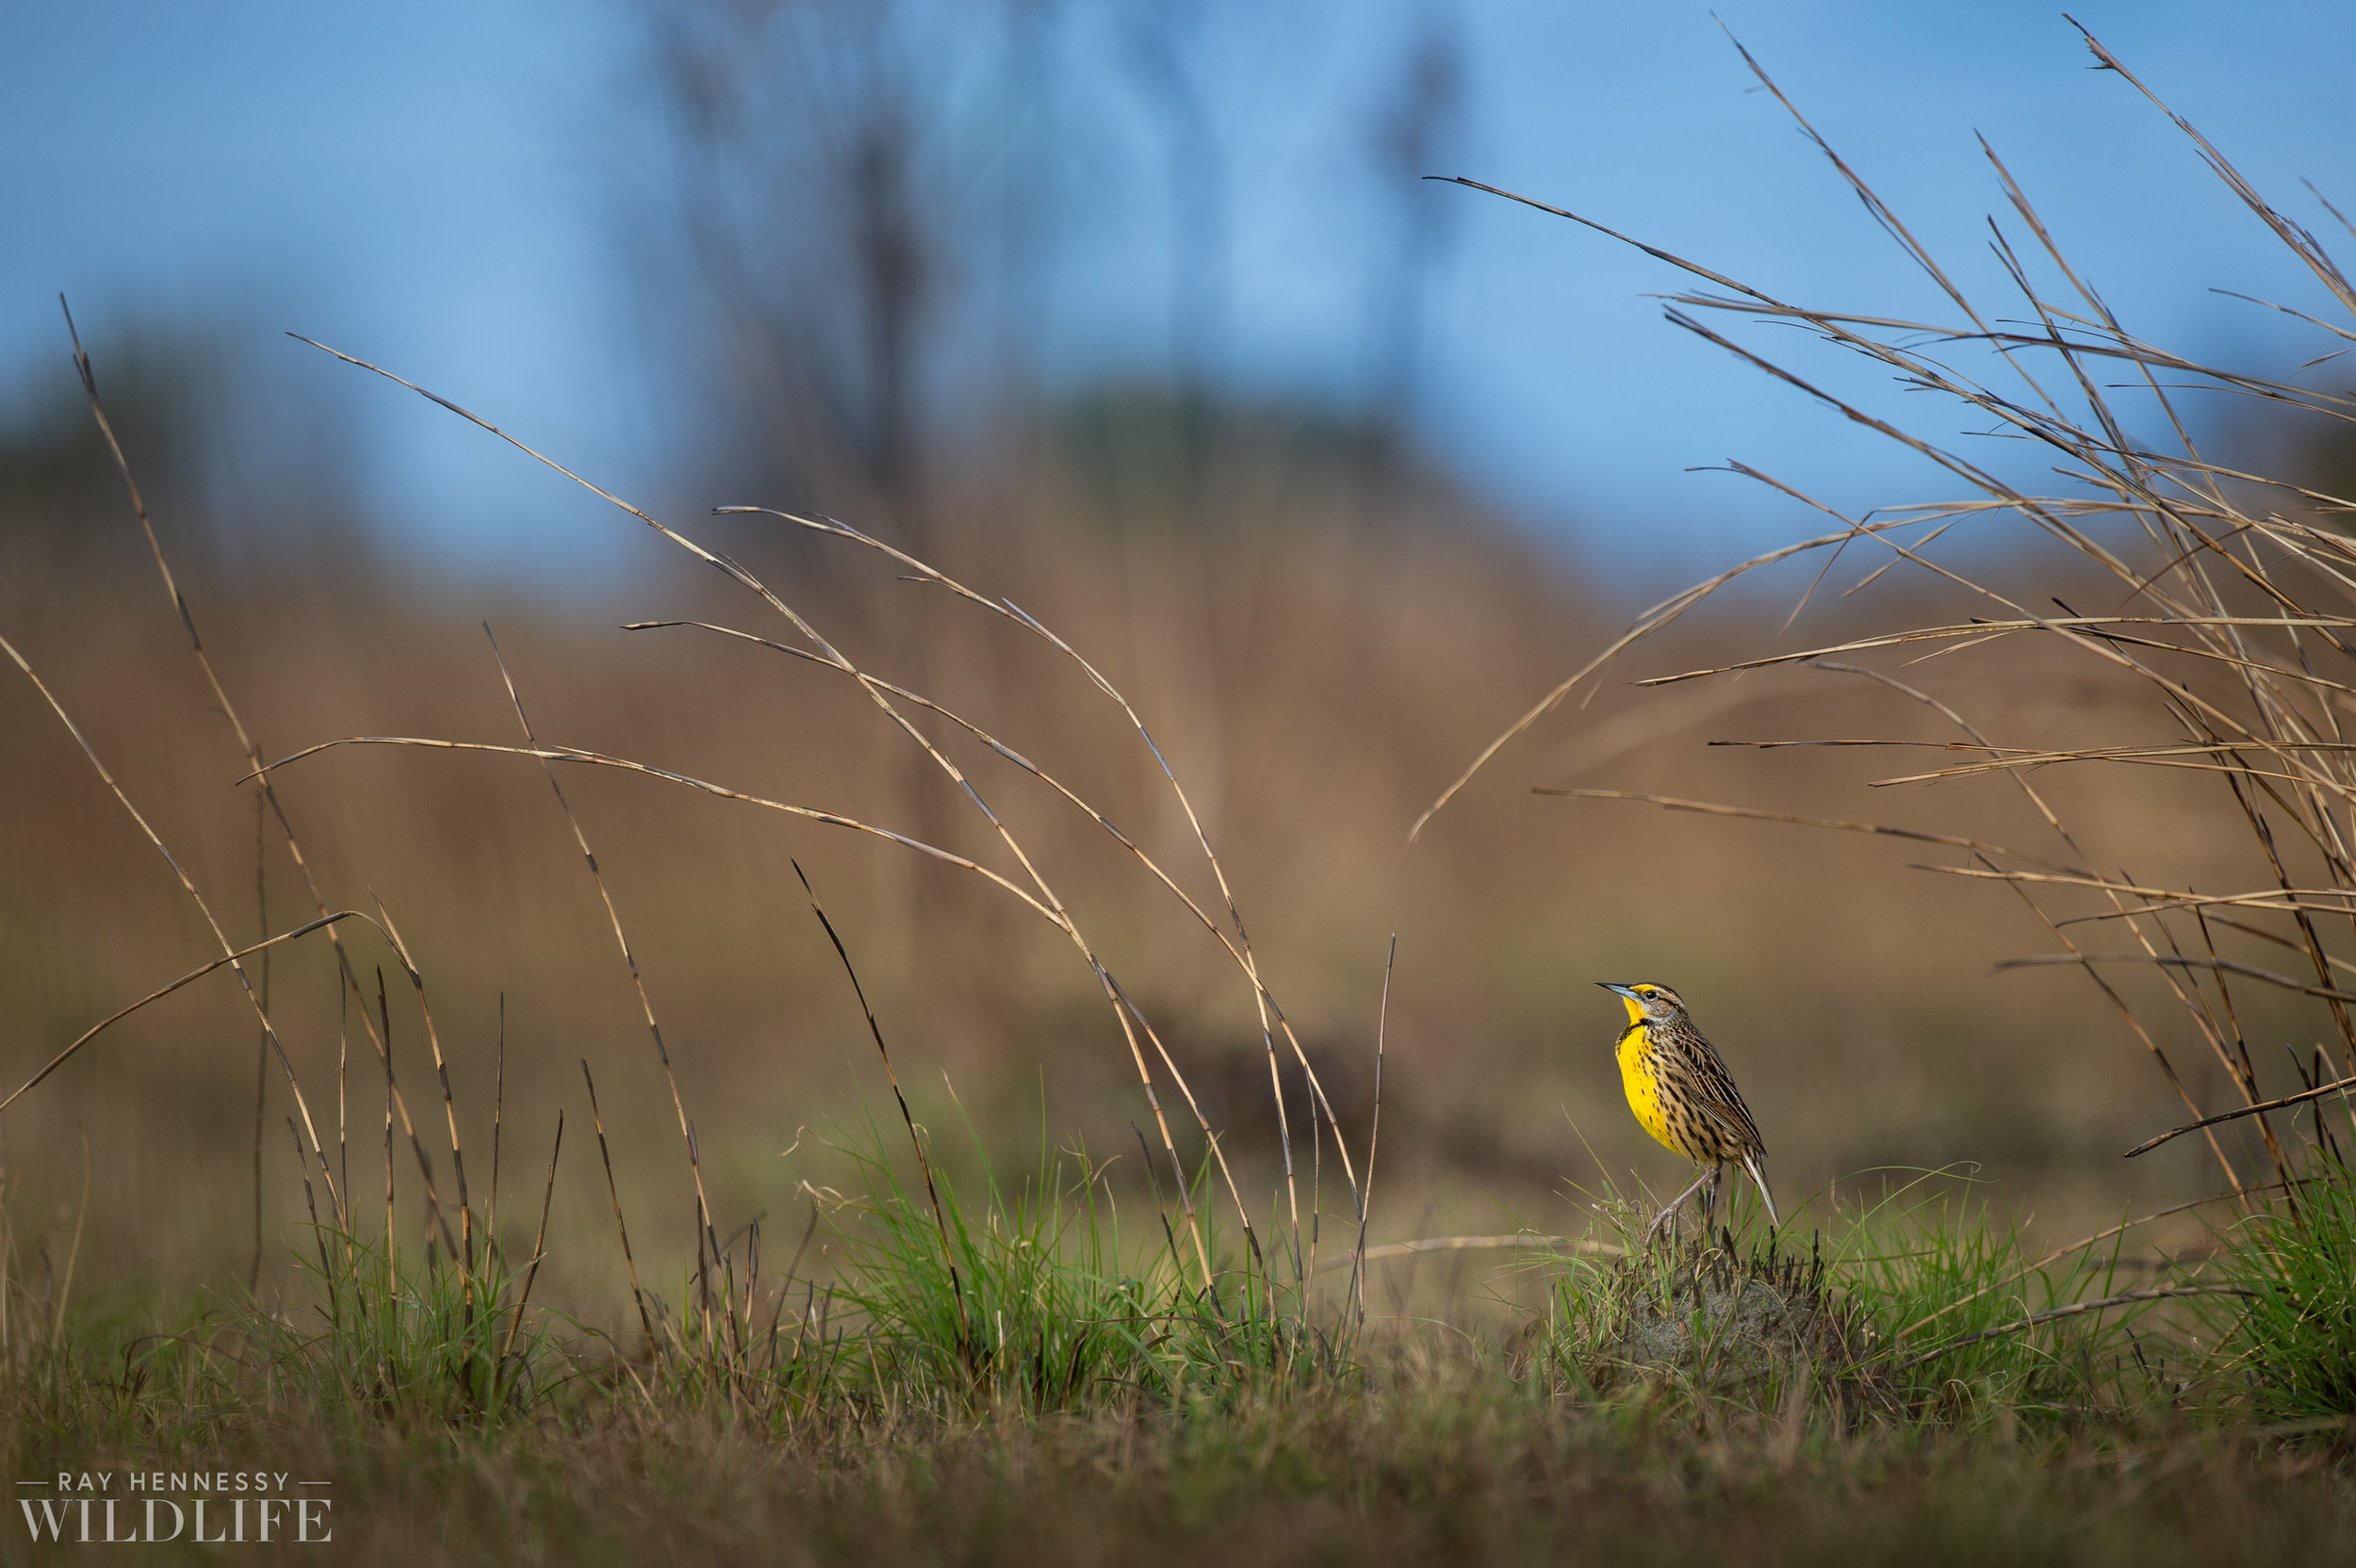 006_florida-grassland-birds.jpg